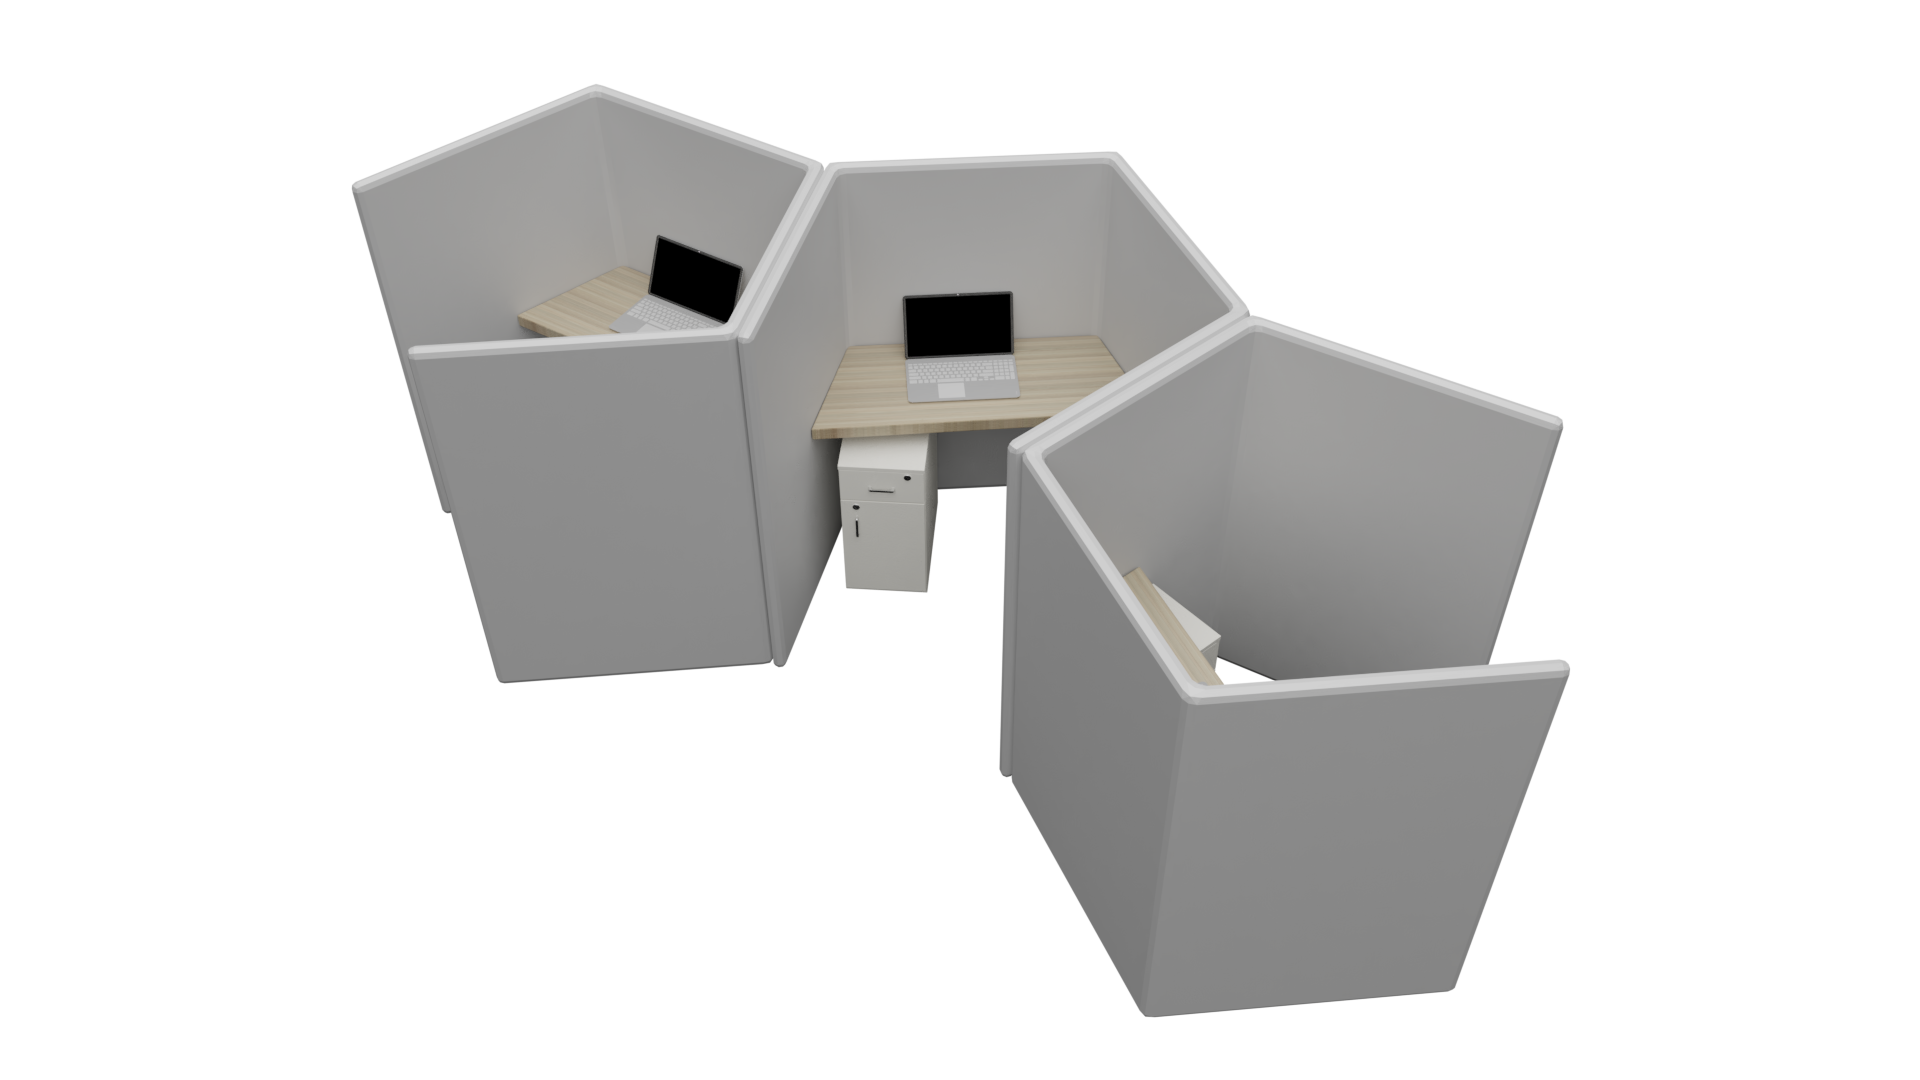 Semi enclosed pods